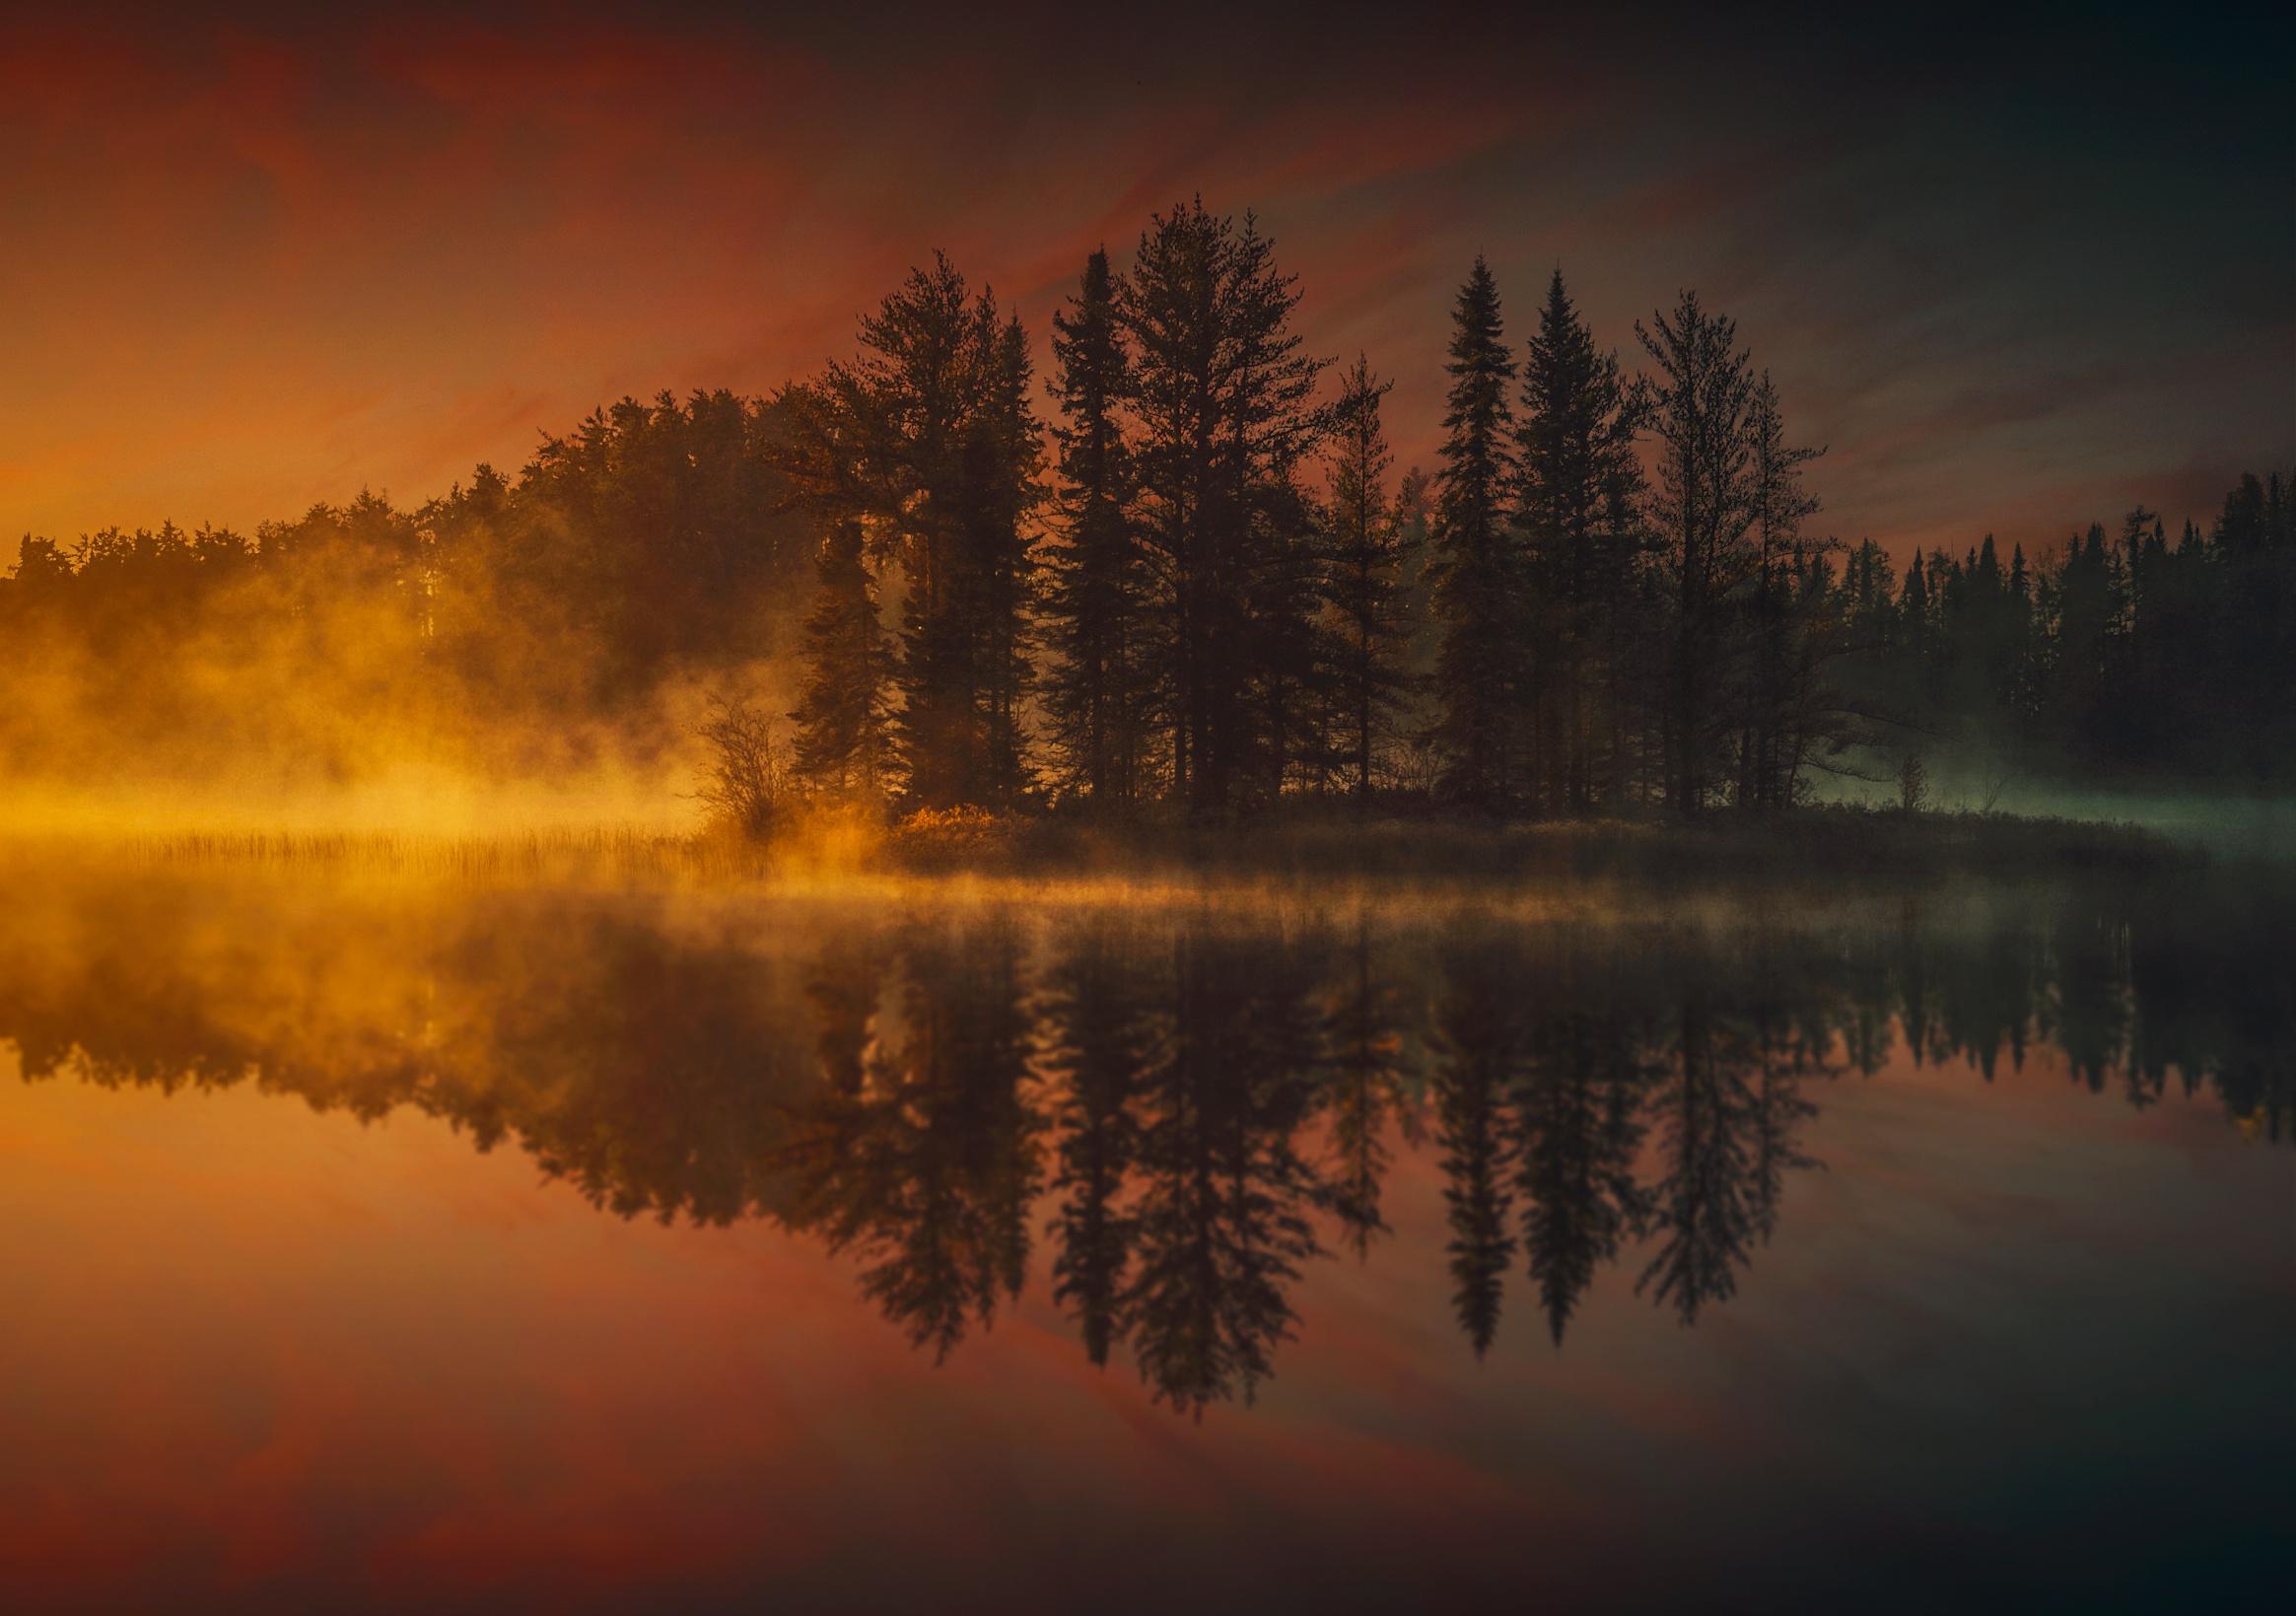 Закат в тумане в лесу  № 1140018 бесплатно